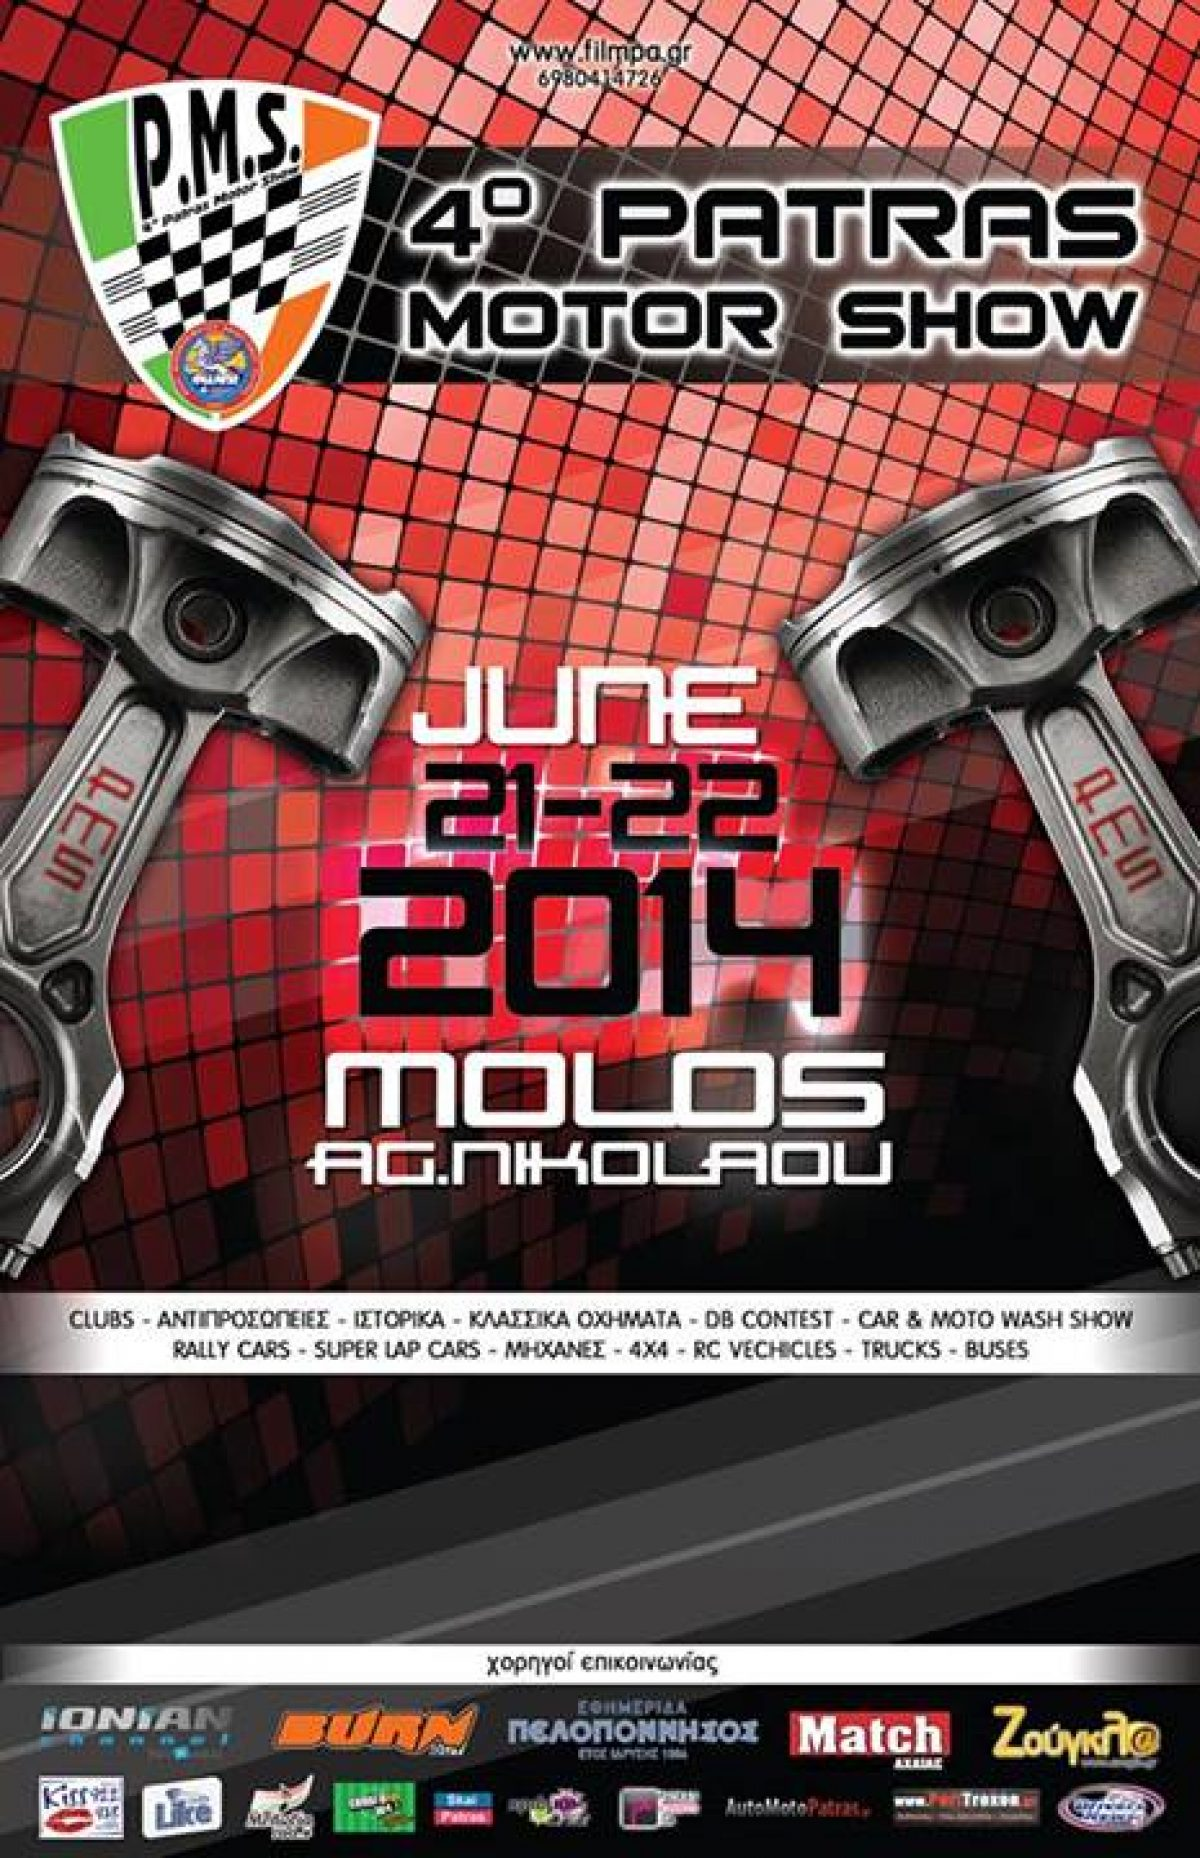 Happy Time: 4o Patras Motor Show 21 22 June 2014